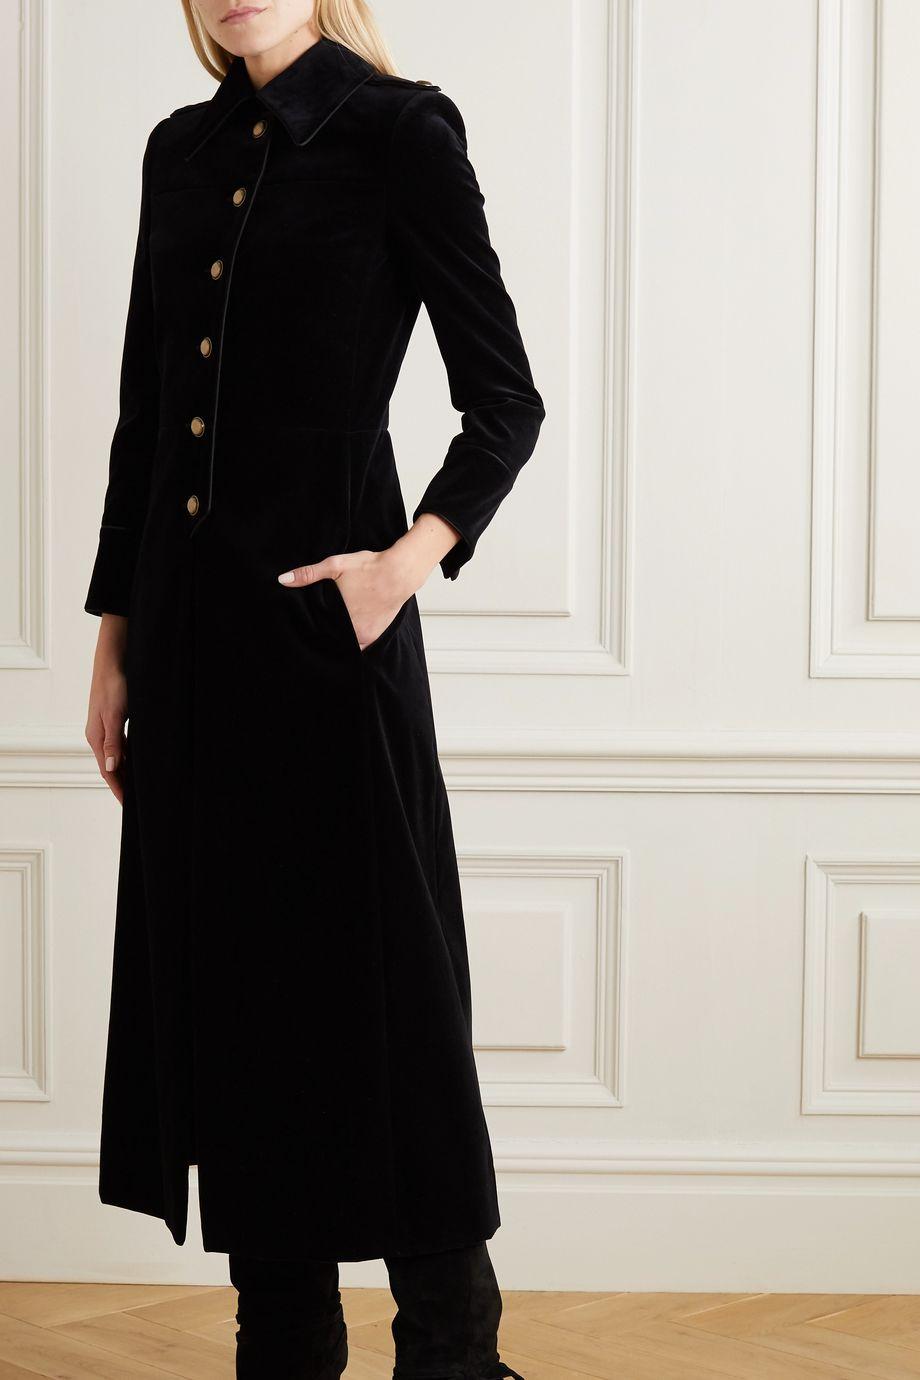 Black Piped Cotton Velvet Coat Saint Laurent Net A Porter Velvet Coat Nice Dresses Victorian Coat [ 1380 x 920 Pixel ]